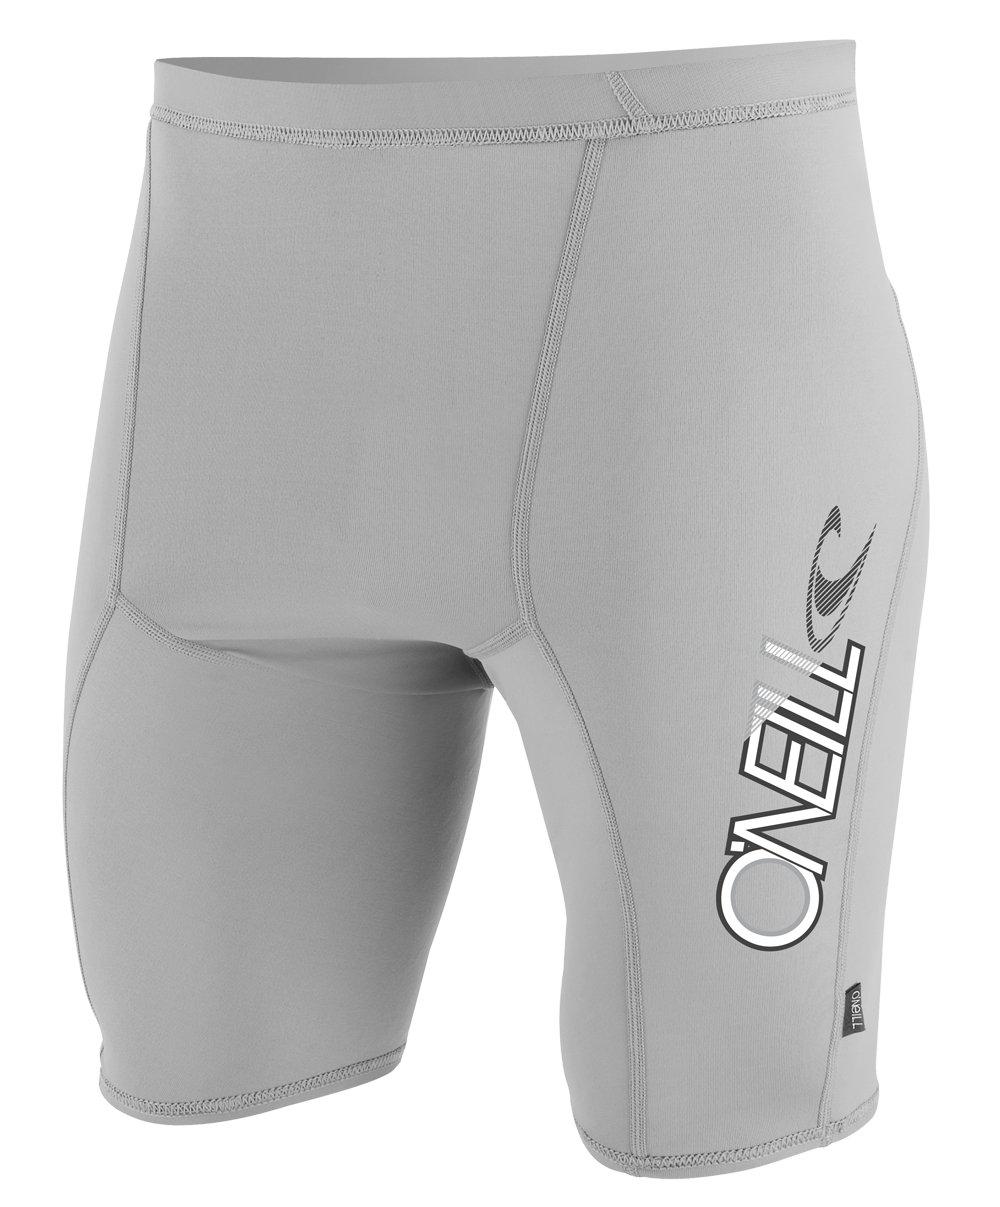 O'Neill Men's Premium Skins UPF 50+ Shorts O' Neill 3525-214-L-P